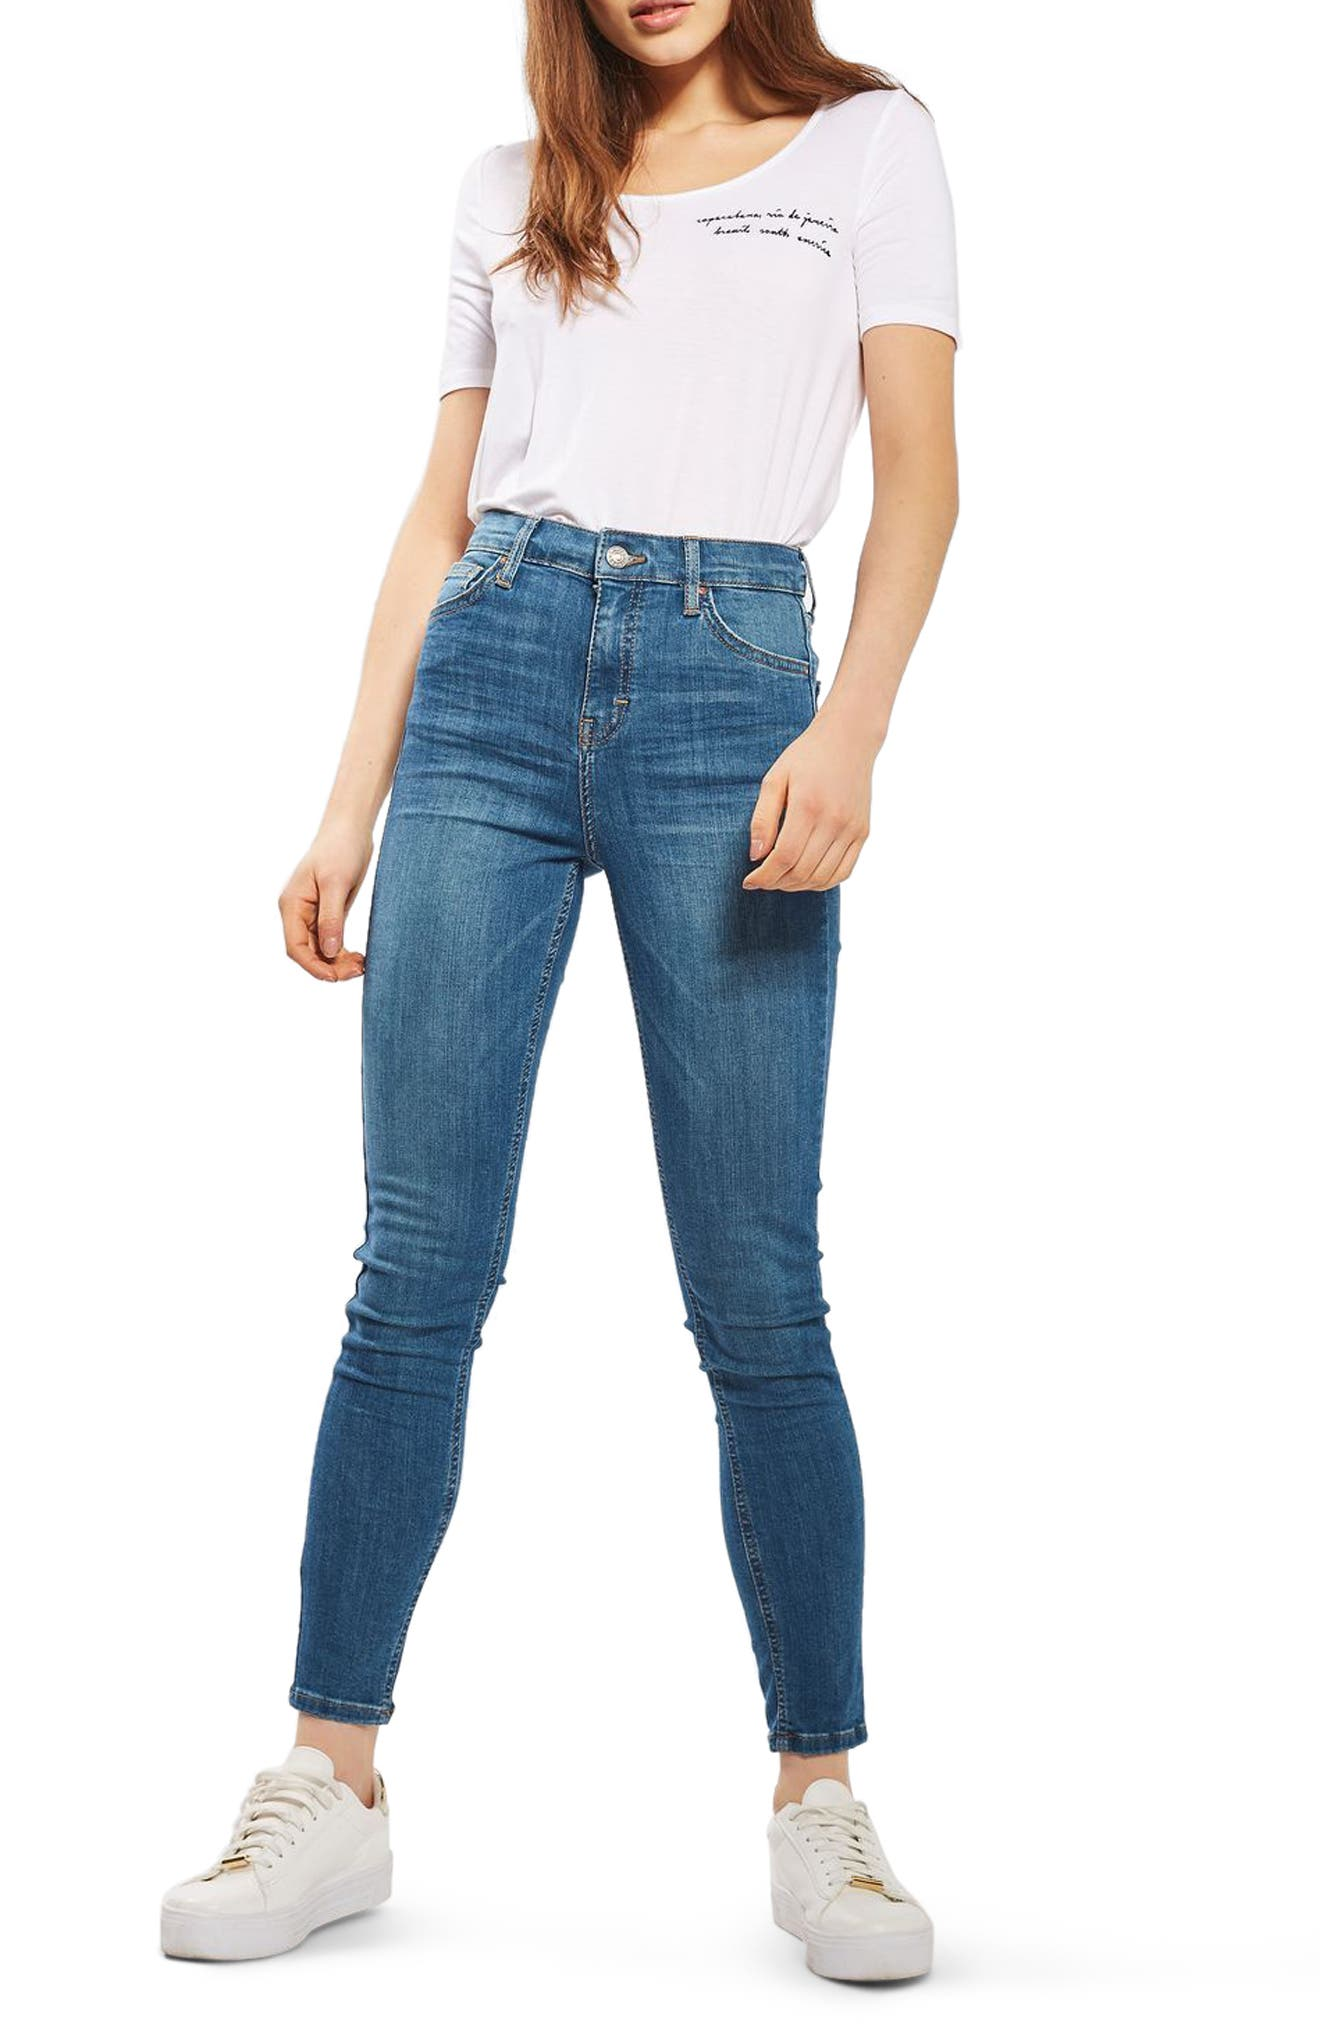 'Jamie' High Waist Ankle Skinny Jeans,                             Main thumbnail 1, color,                             400